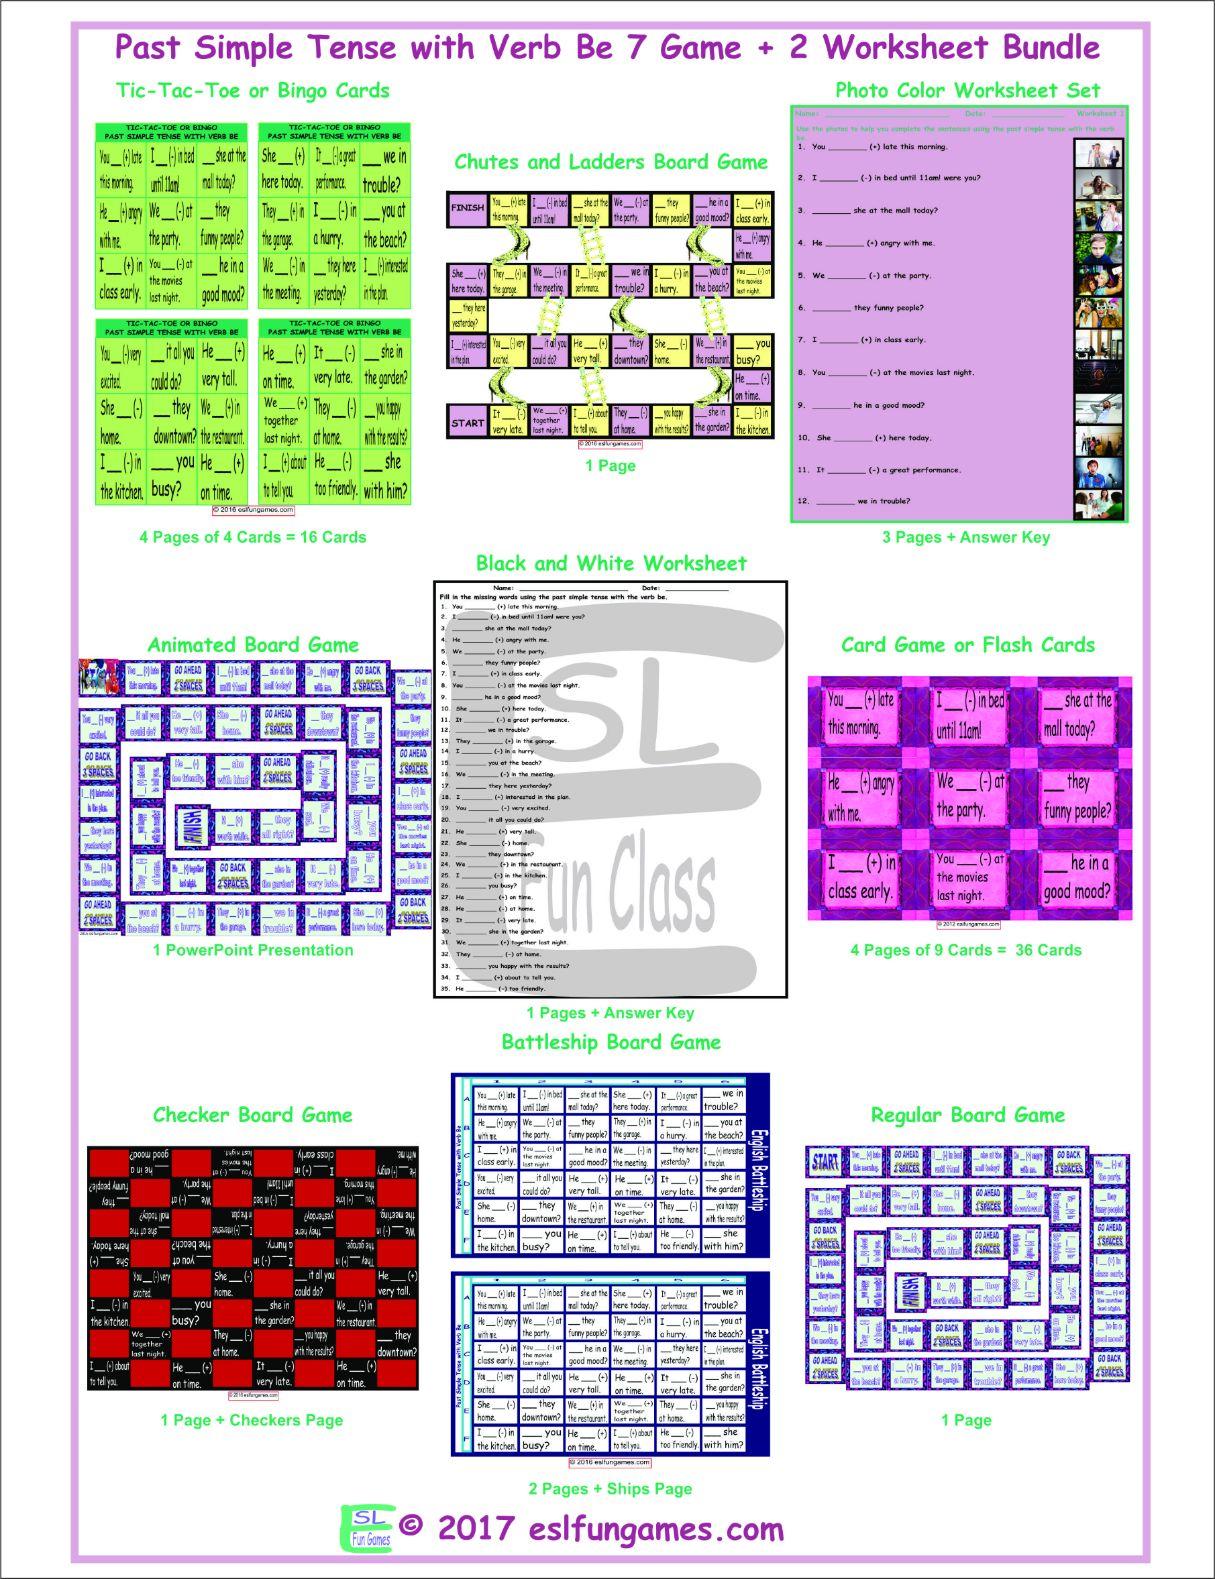 Past Simple Tense With Verb Be 7 Game Plus 2 Worksheet